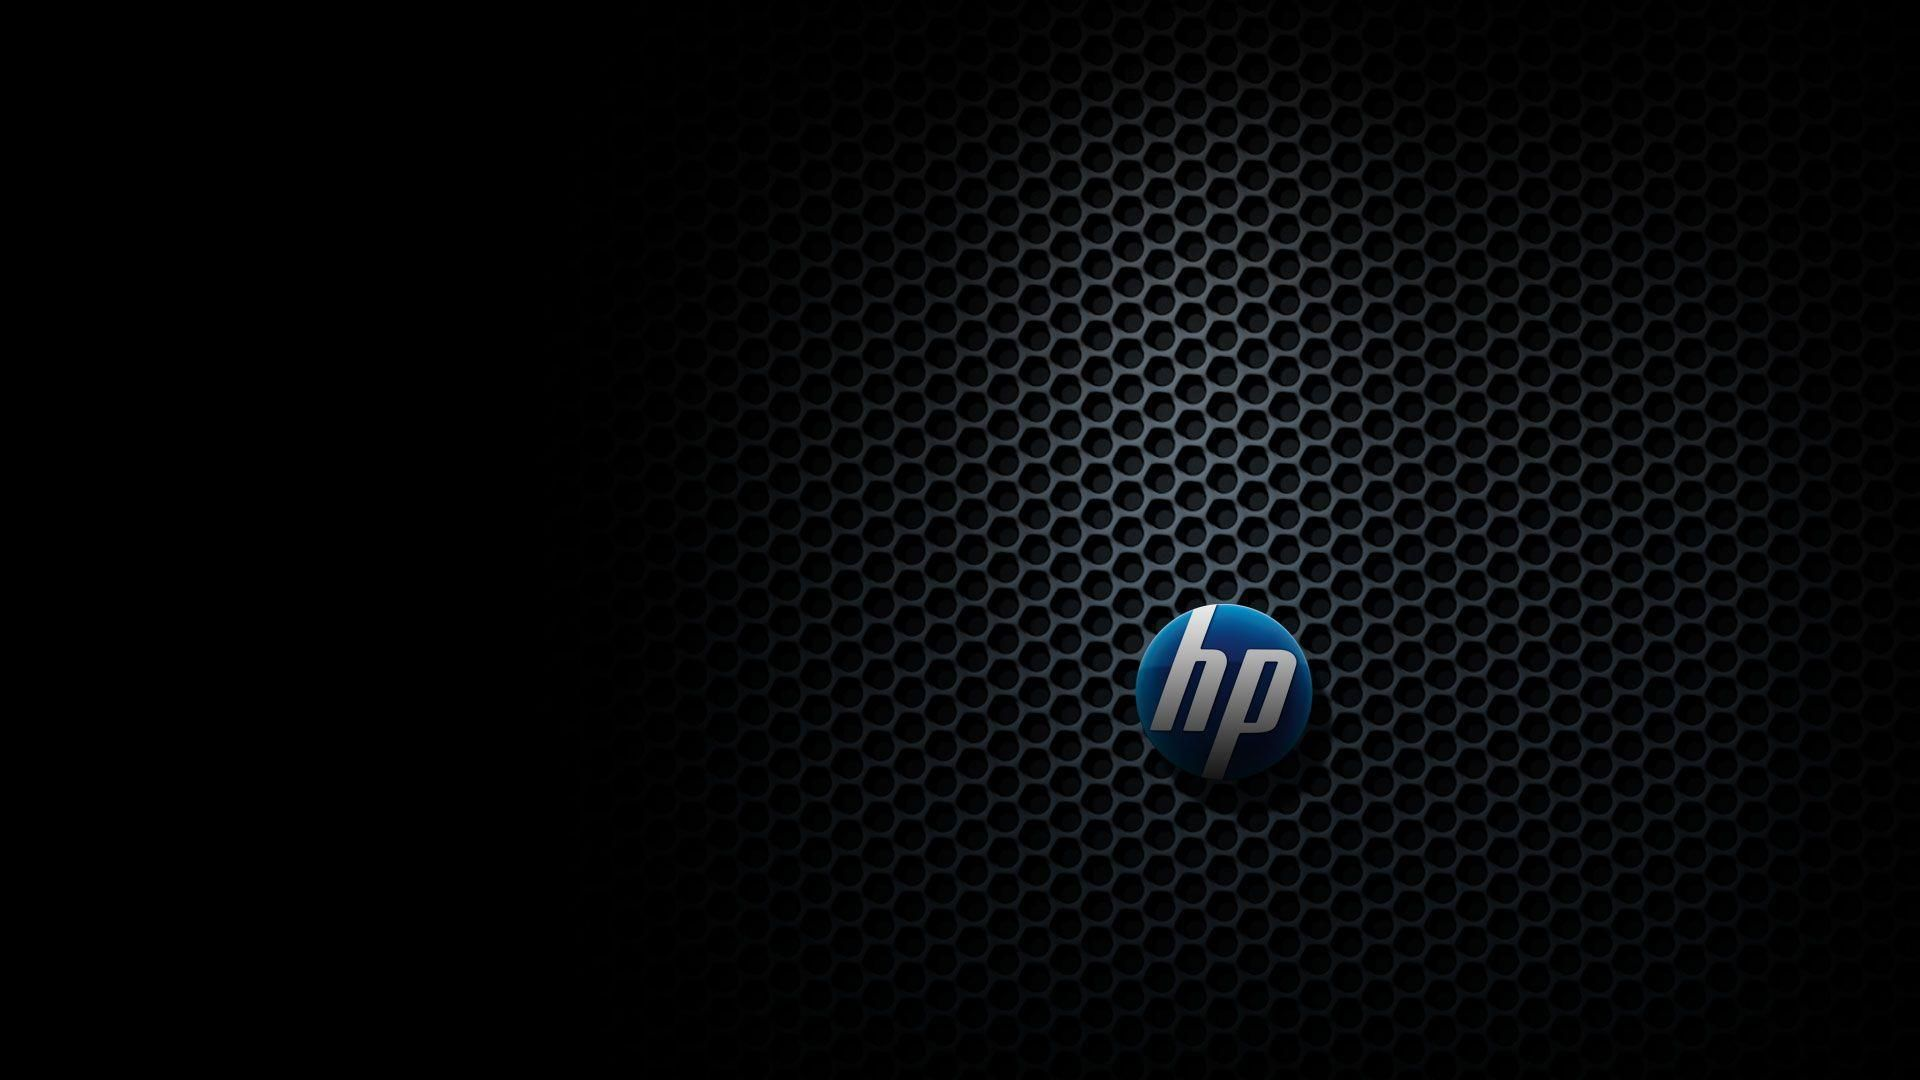 HP Black Wallpapers 29 Wallpapers HD Wallpapers Hd wallpaper 1920x1080